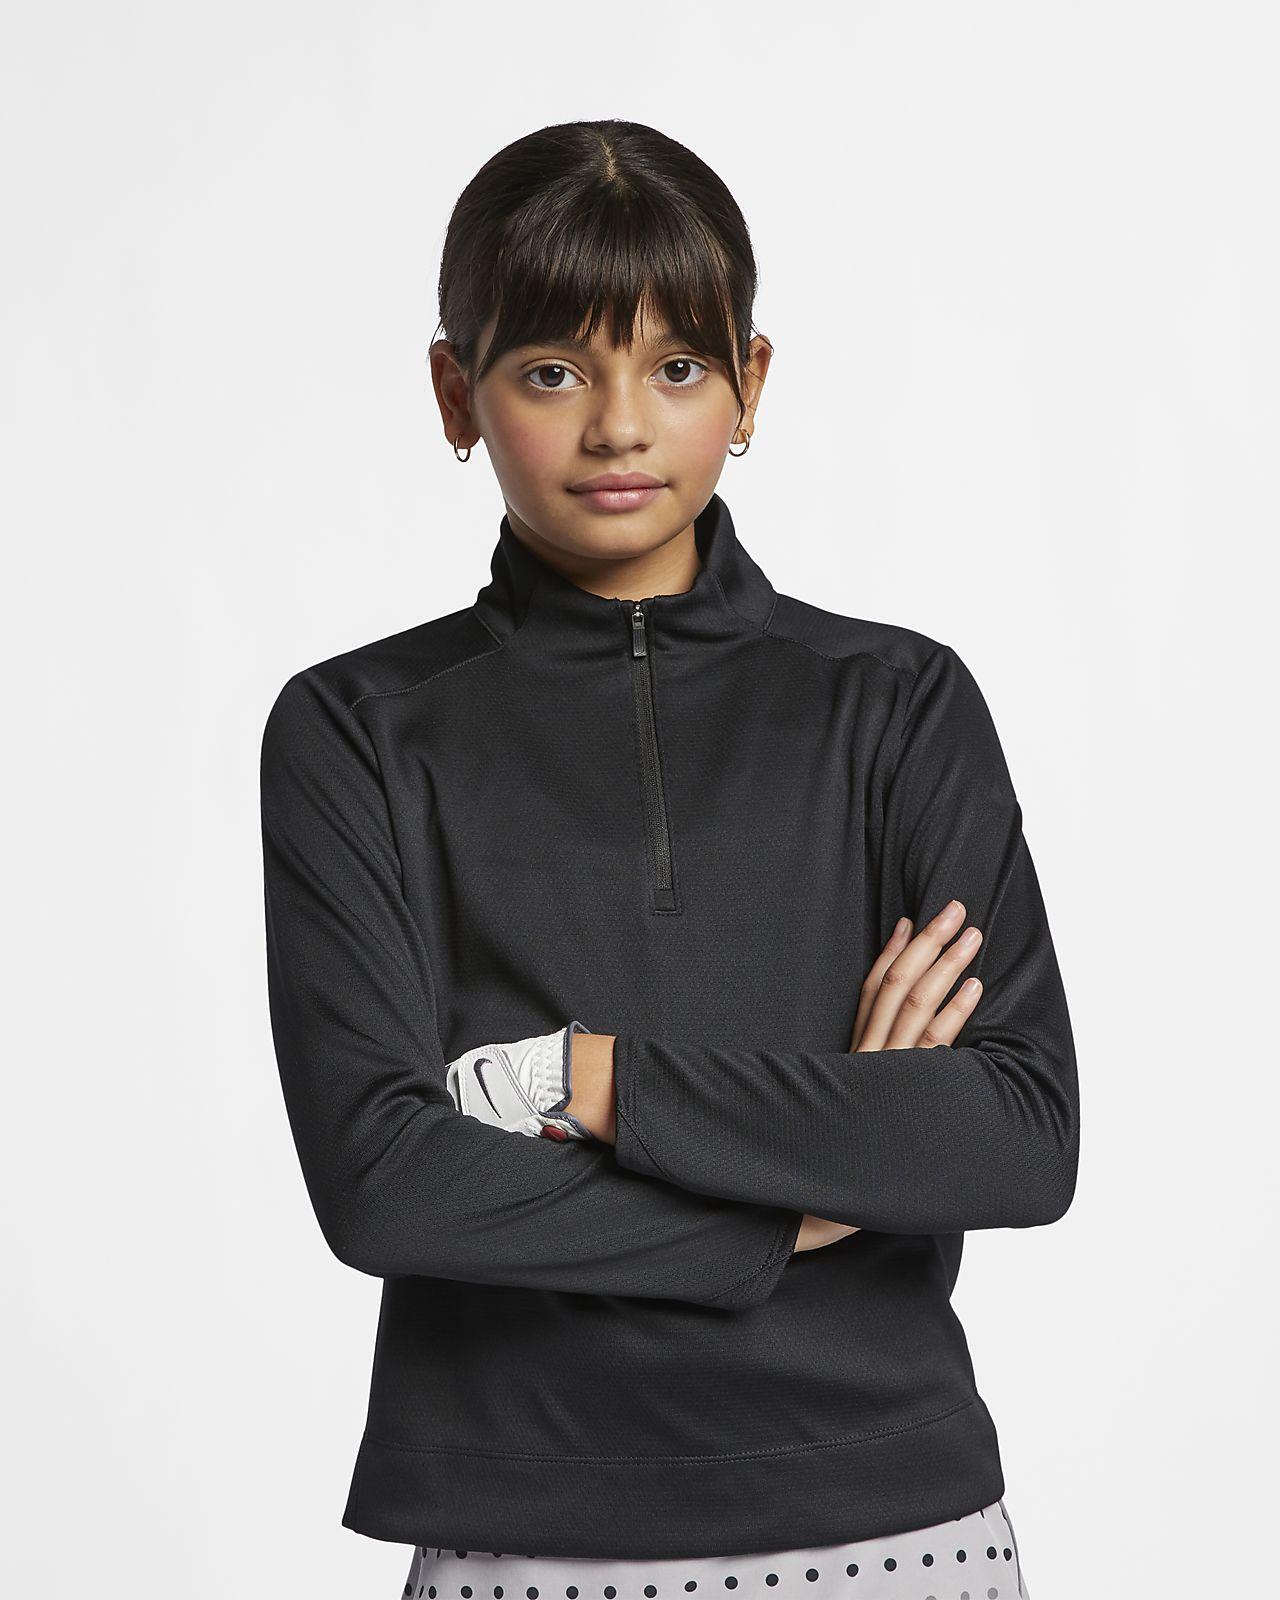 Golftröja Nike Dri-FIT med kvartslång dragkedja för ungdom (tjejer)